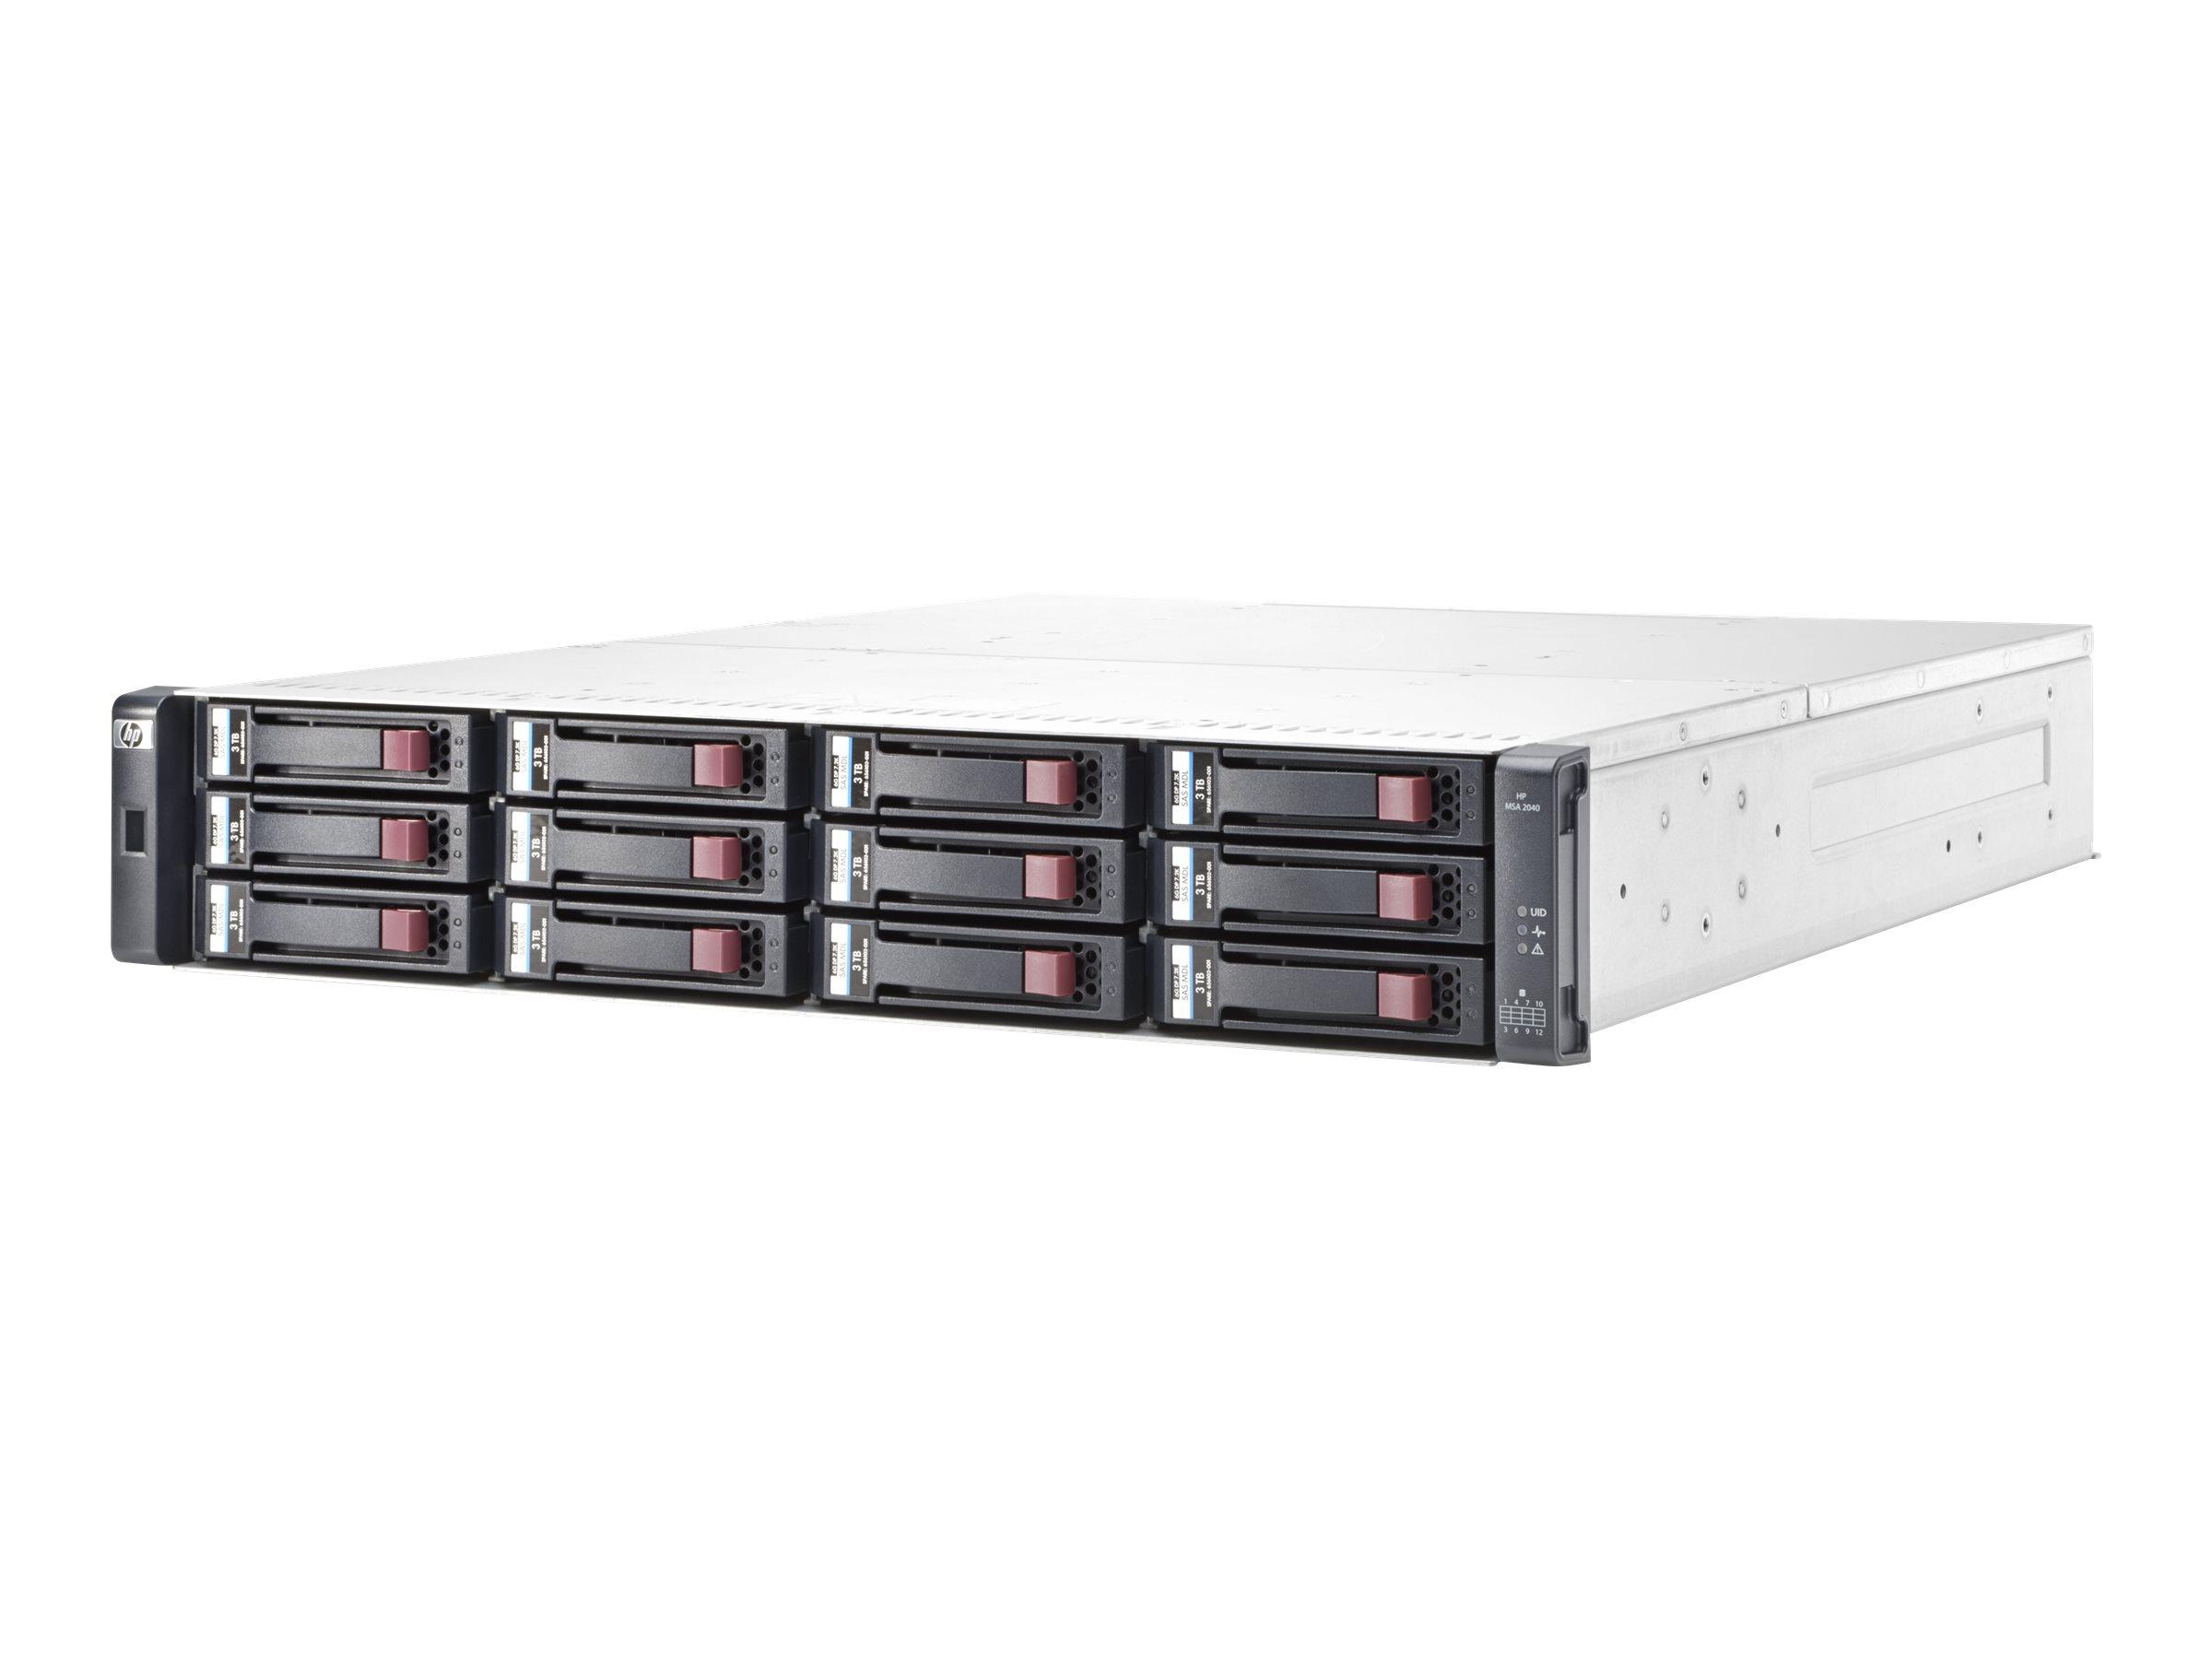 HPE Modular Smart Array 2040 SAN Dual Controller LFF Storage - Festplatten-Array - 12 Schächte (SAS-2) - 8Gb Fibre Channel, iSCS